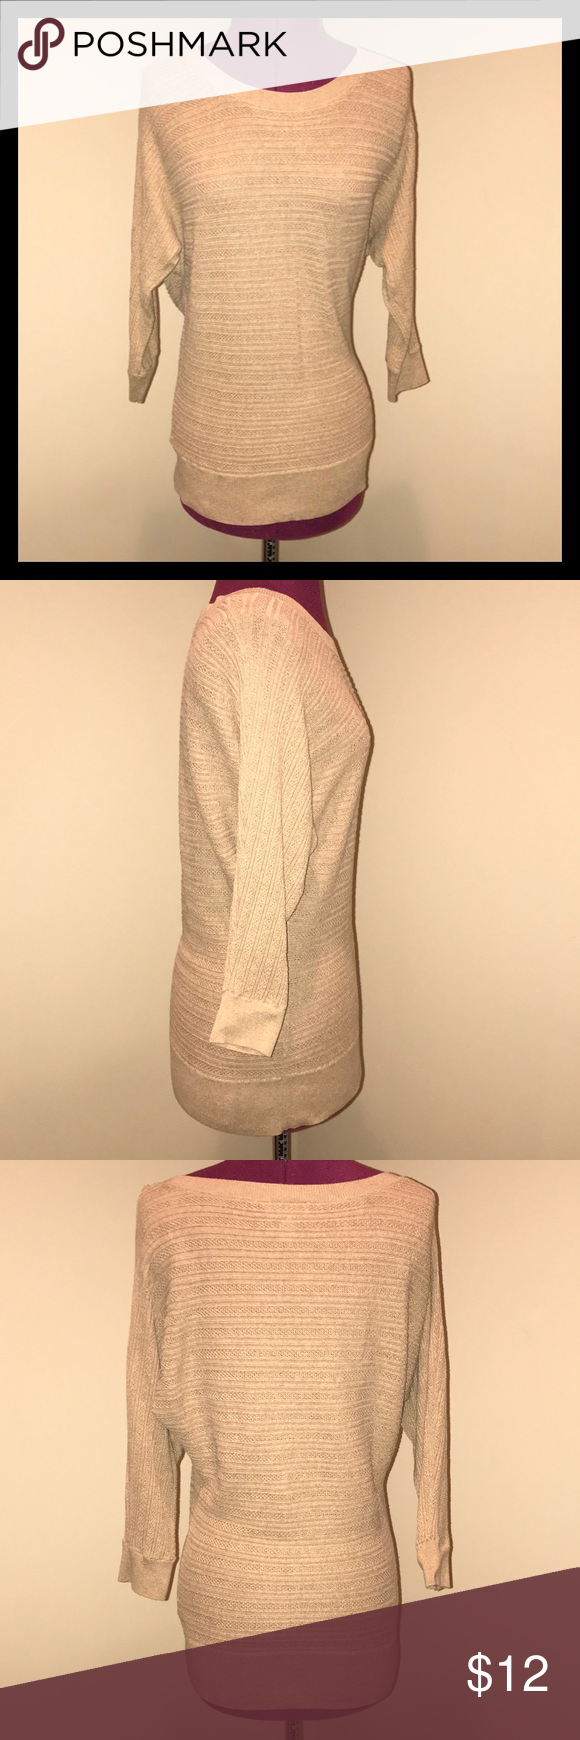 Loft 3/4 Sleeve Sweater Loft 3/4 sleeve tan sweater. Size small.  Gently used. LOFT Sweaters